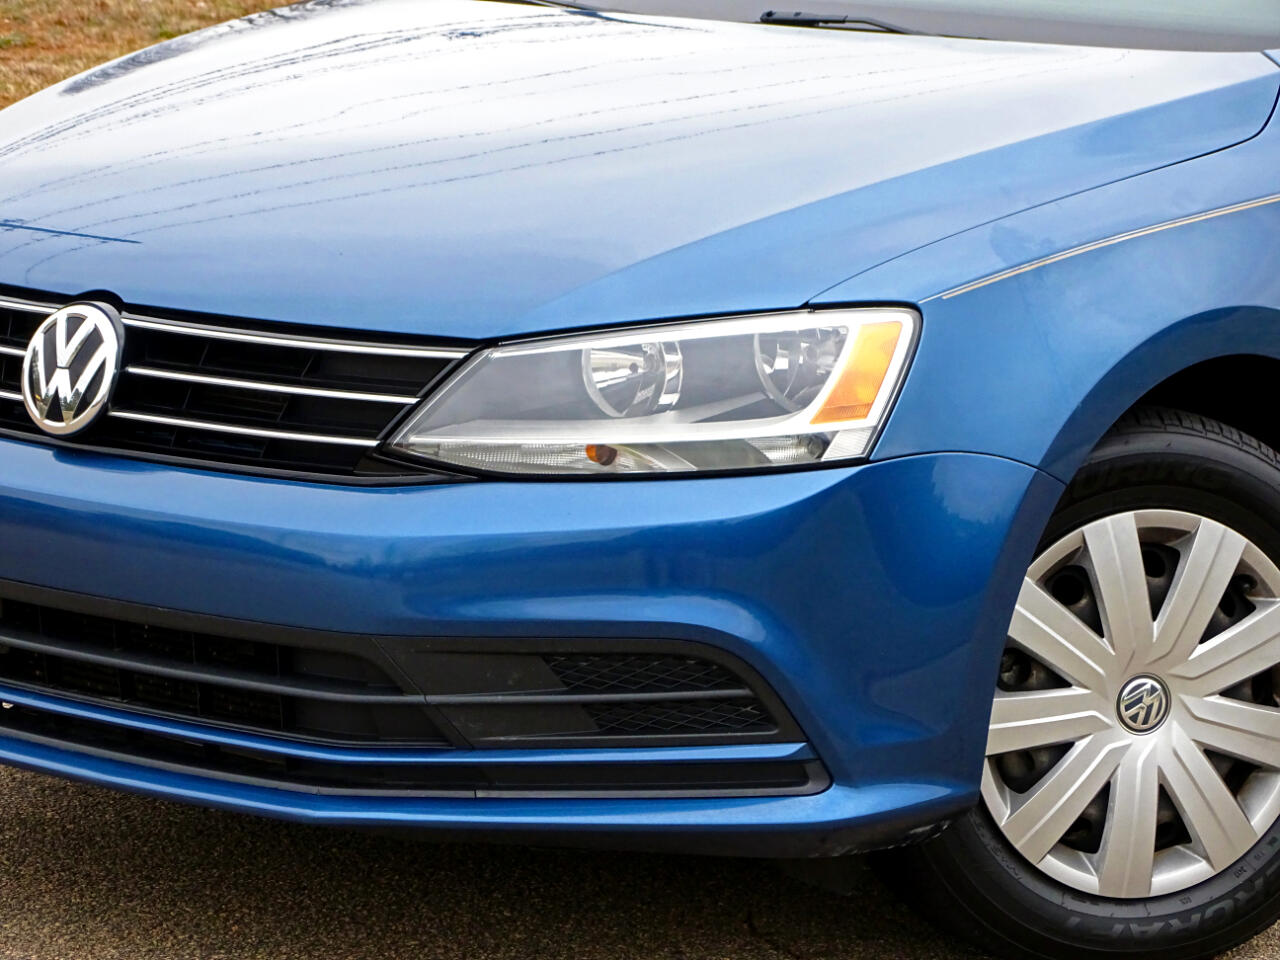 Volkswagen Jetta Sedan 4dr Auto 1.4T S 2016